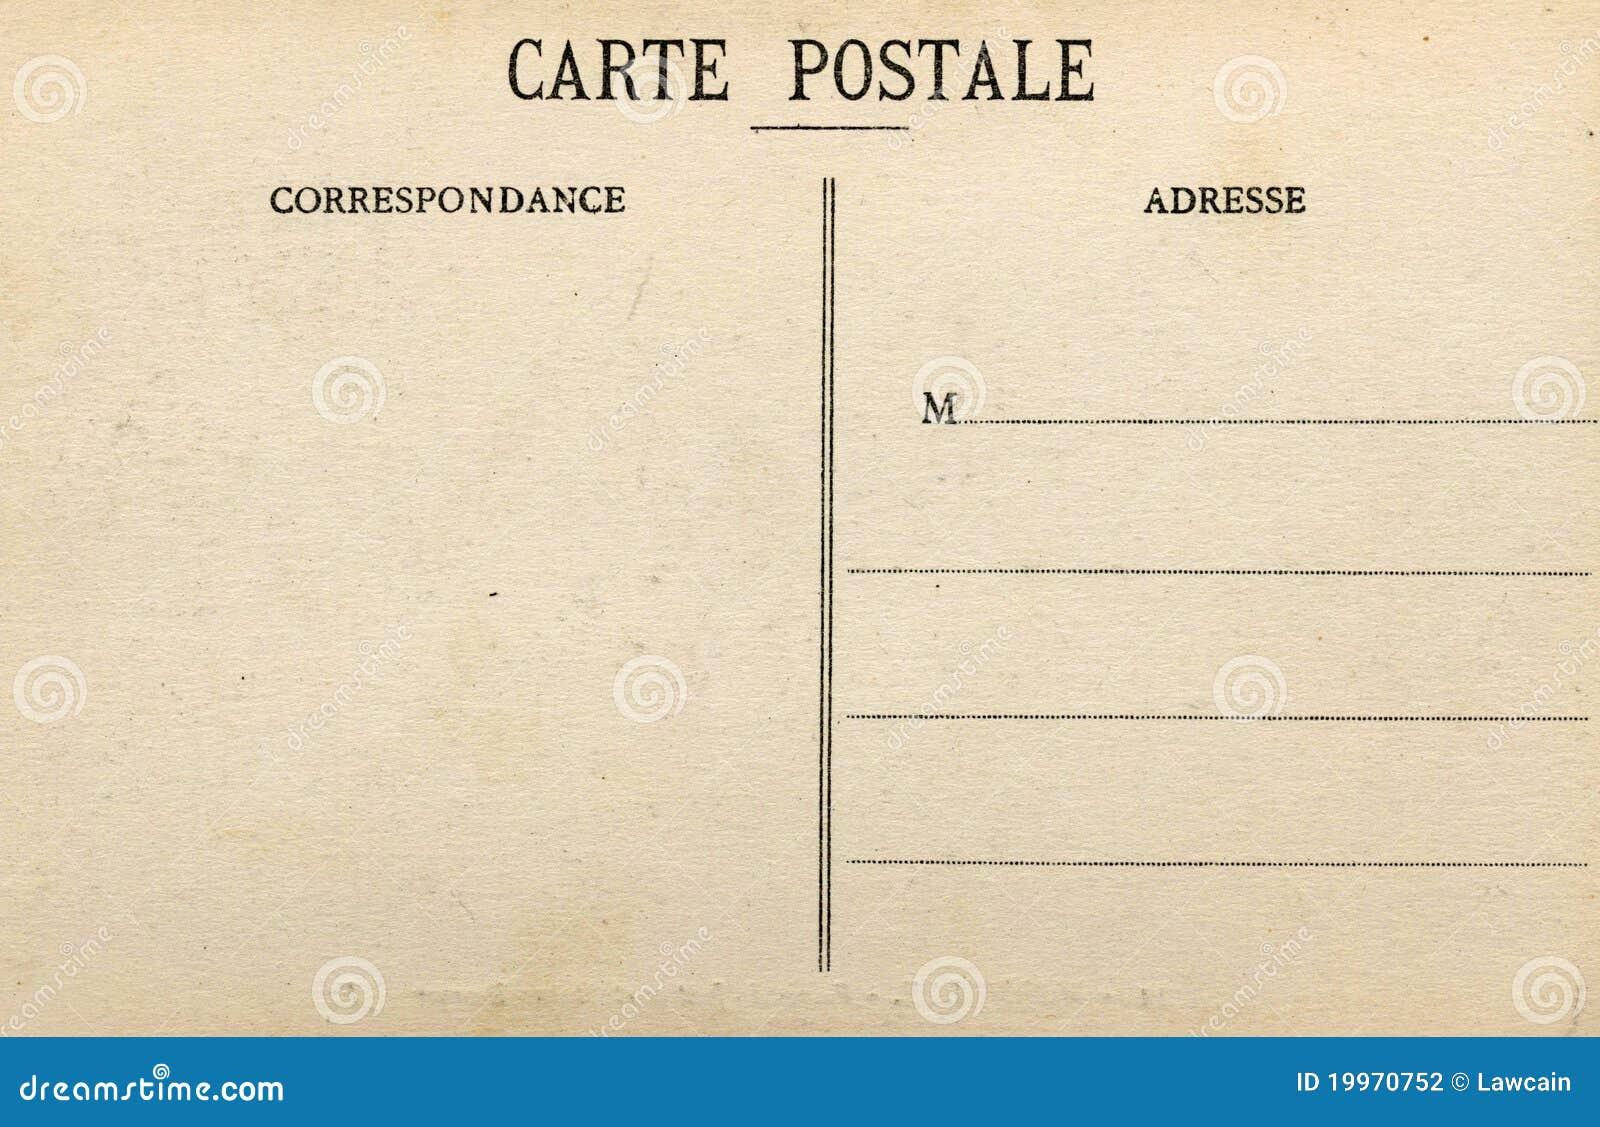 Carte Postale Francaise.Carte Postale Francaise Blanc Photo Stock Image Du Vieux